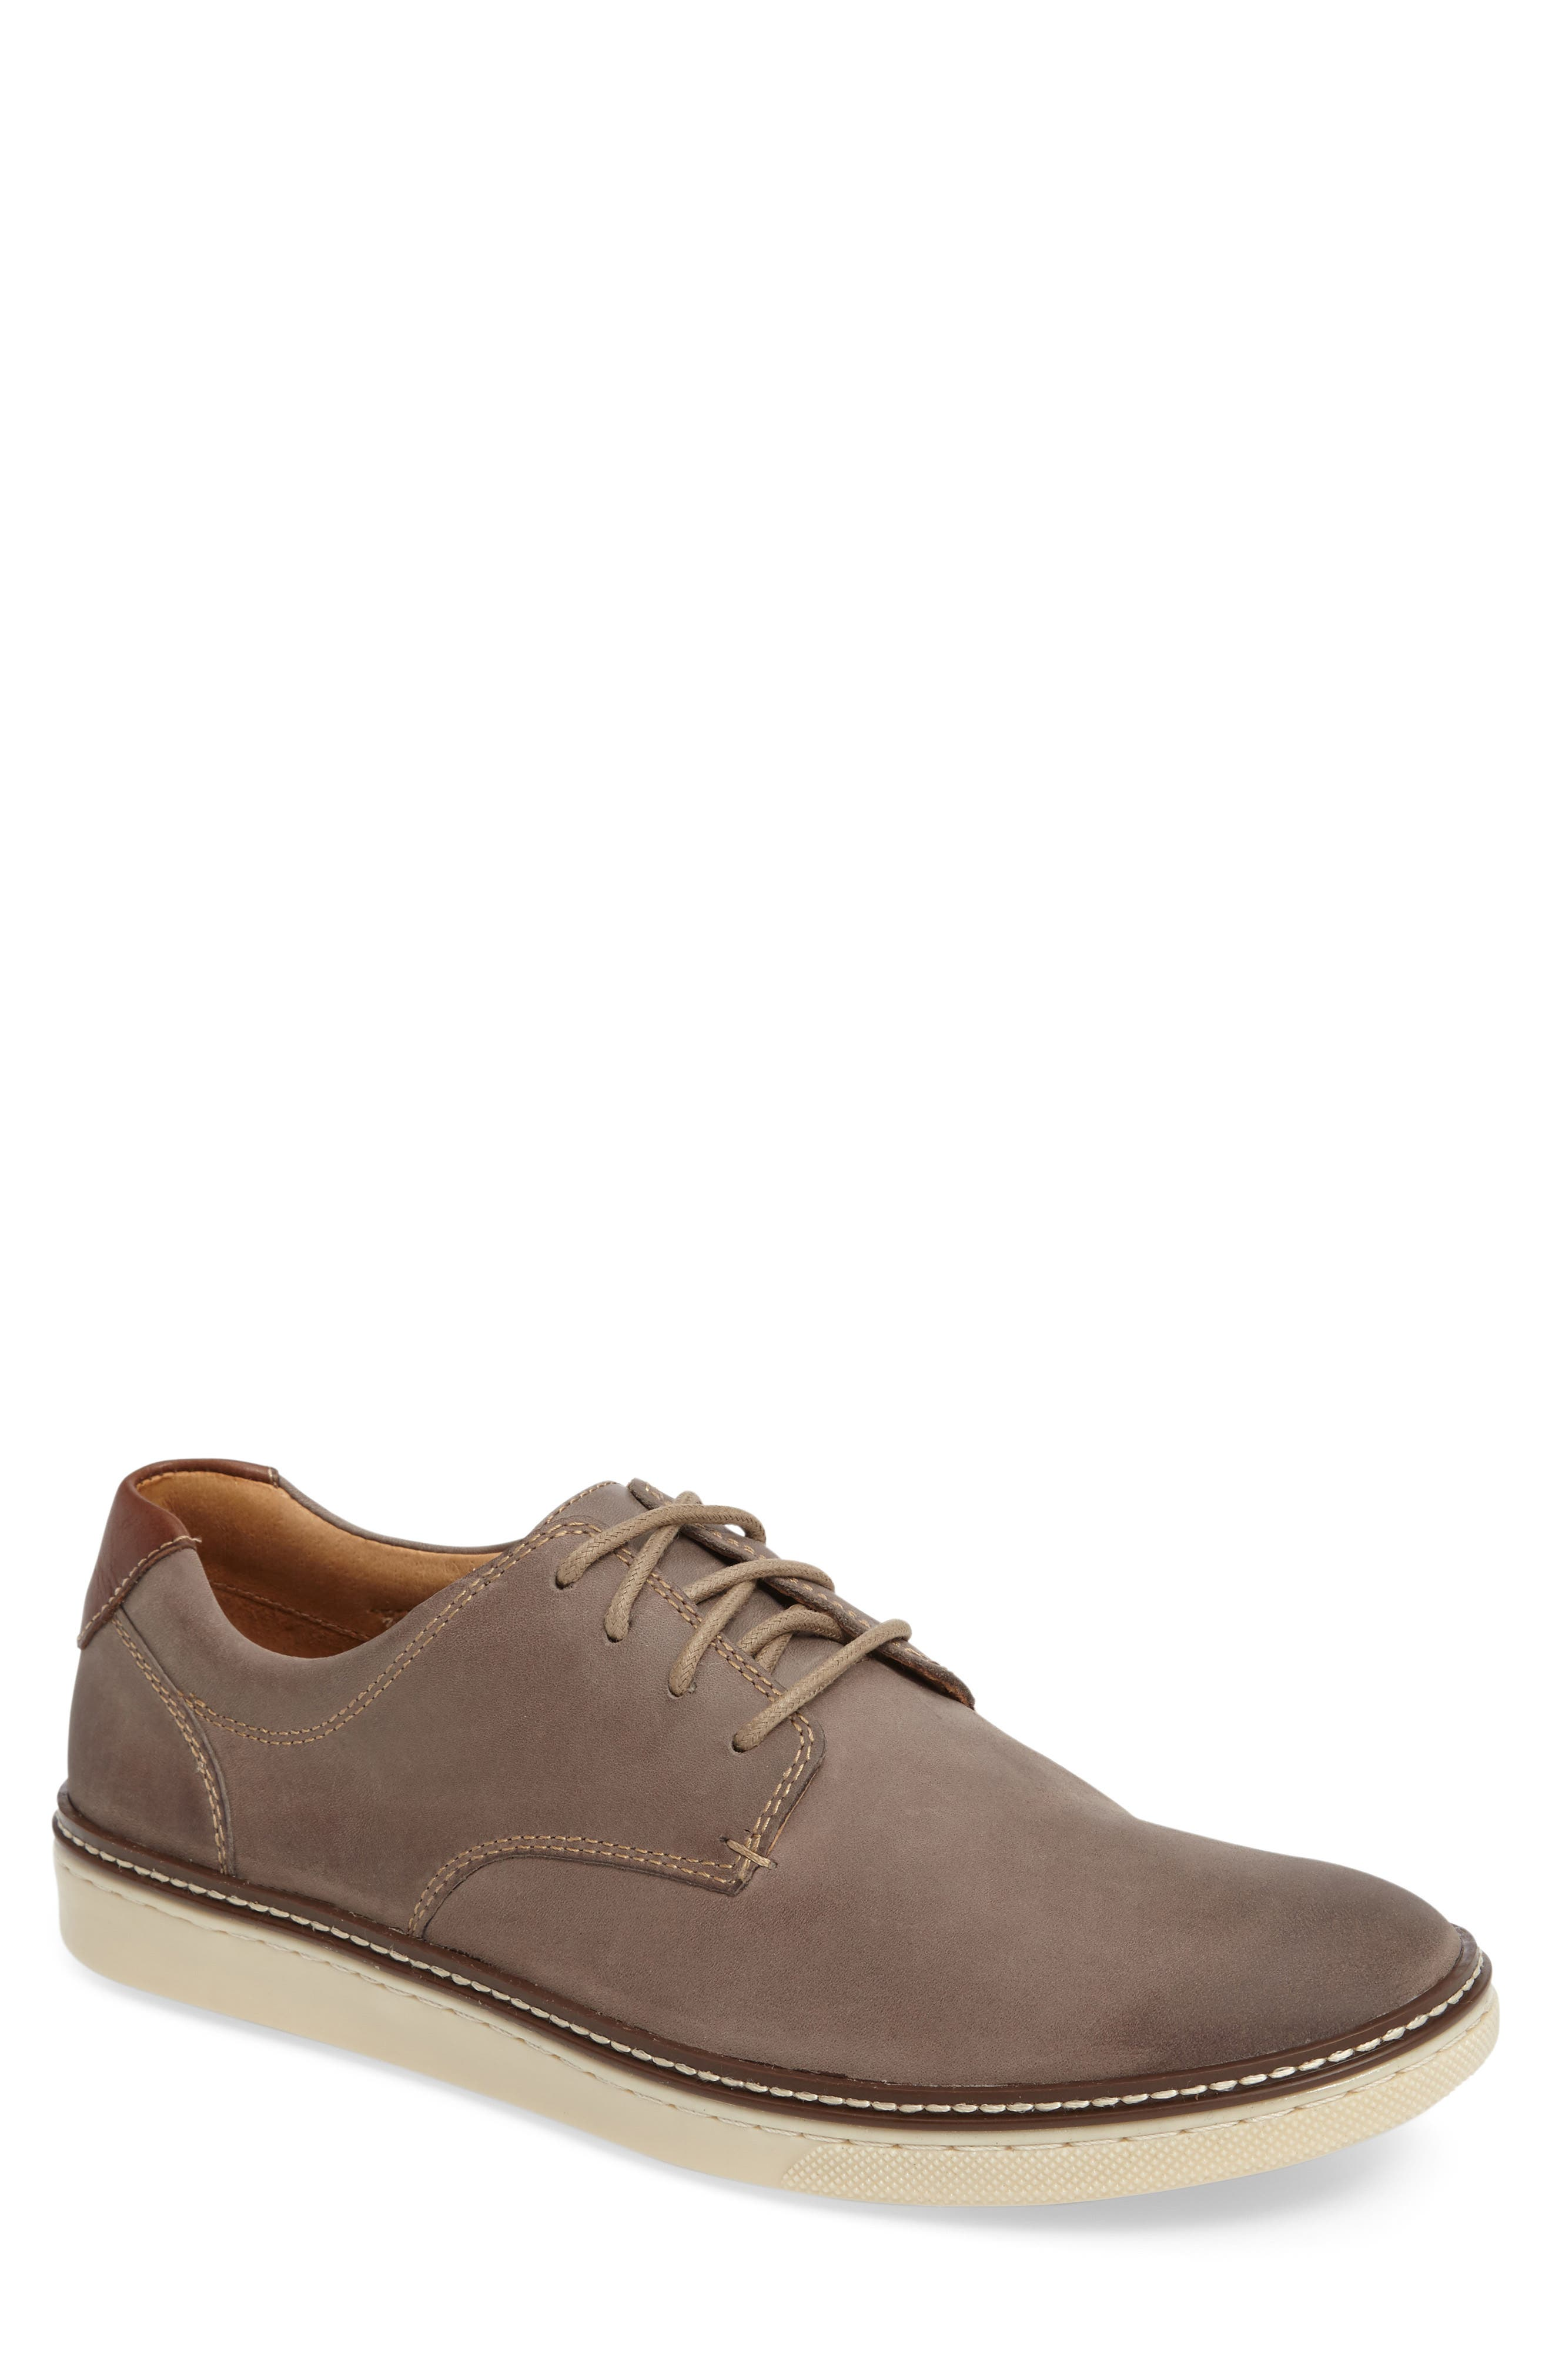 McGuffey Plain Toe Sneaker,                         Main,                         color, GREY NUBUCK LEATHER